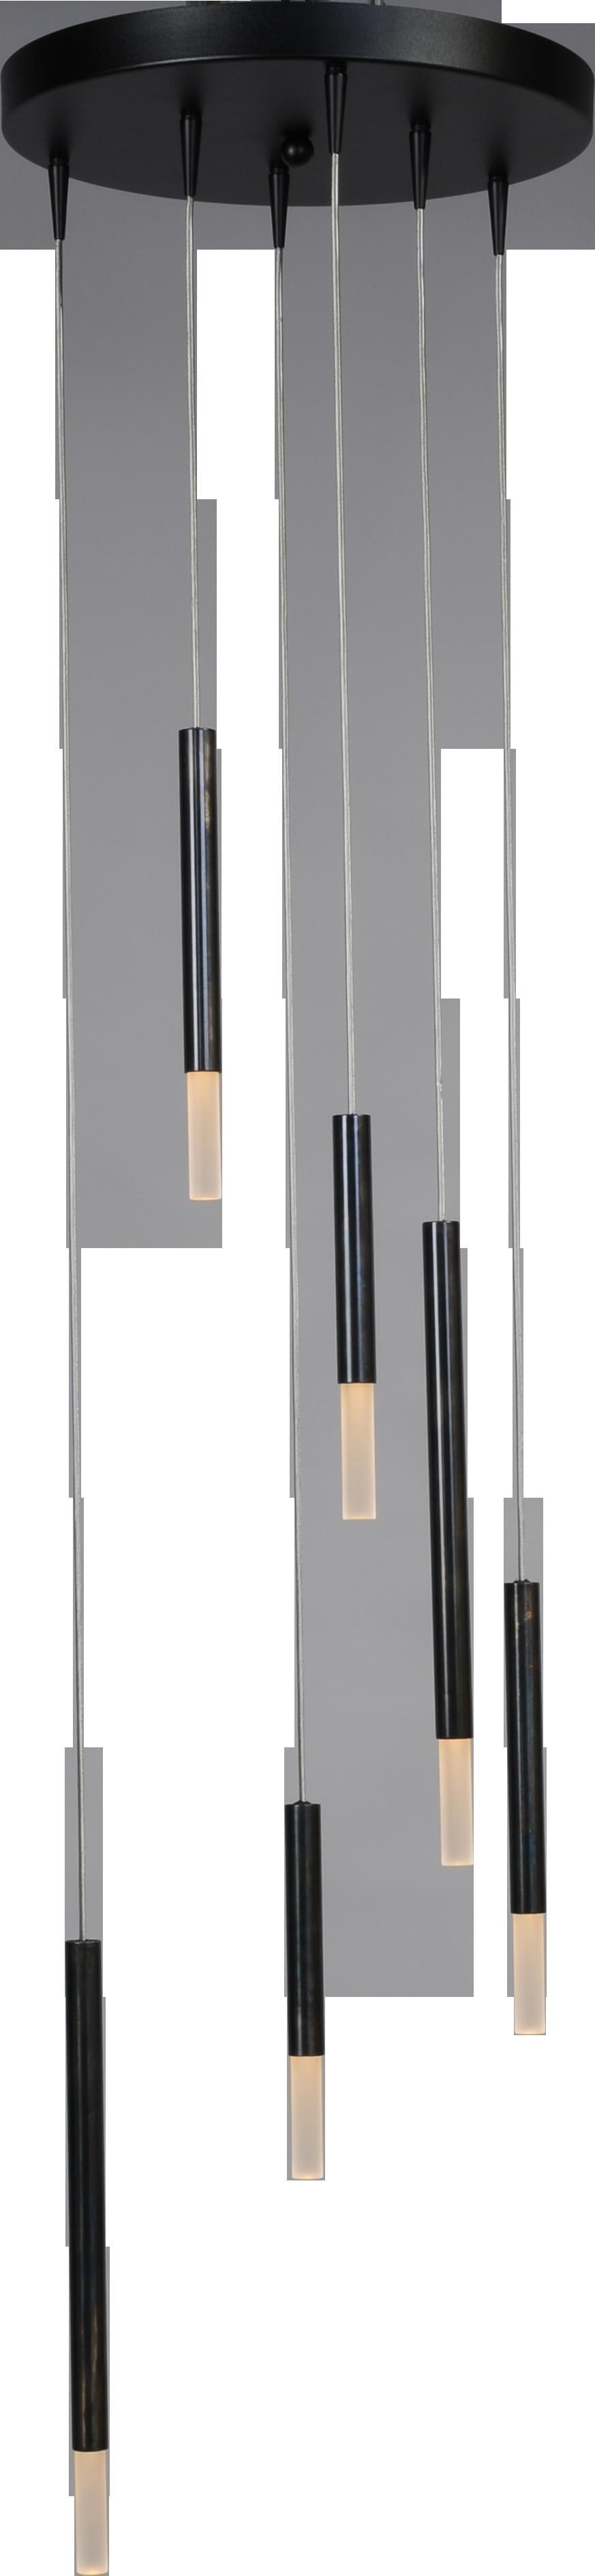 Flute HL FLUTE 6LTS BLACK/DAPPLED OIL Ø35CM